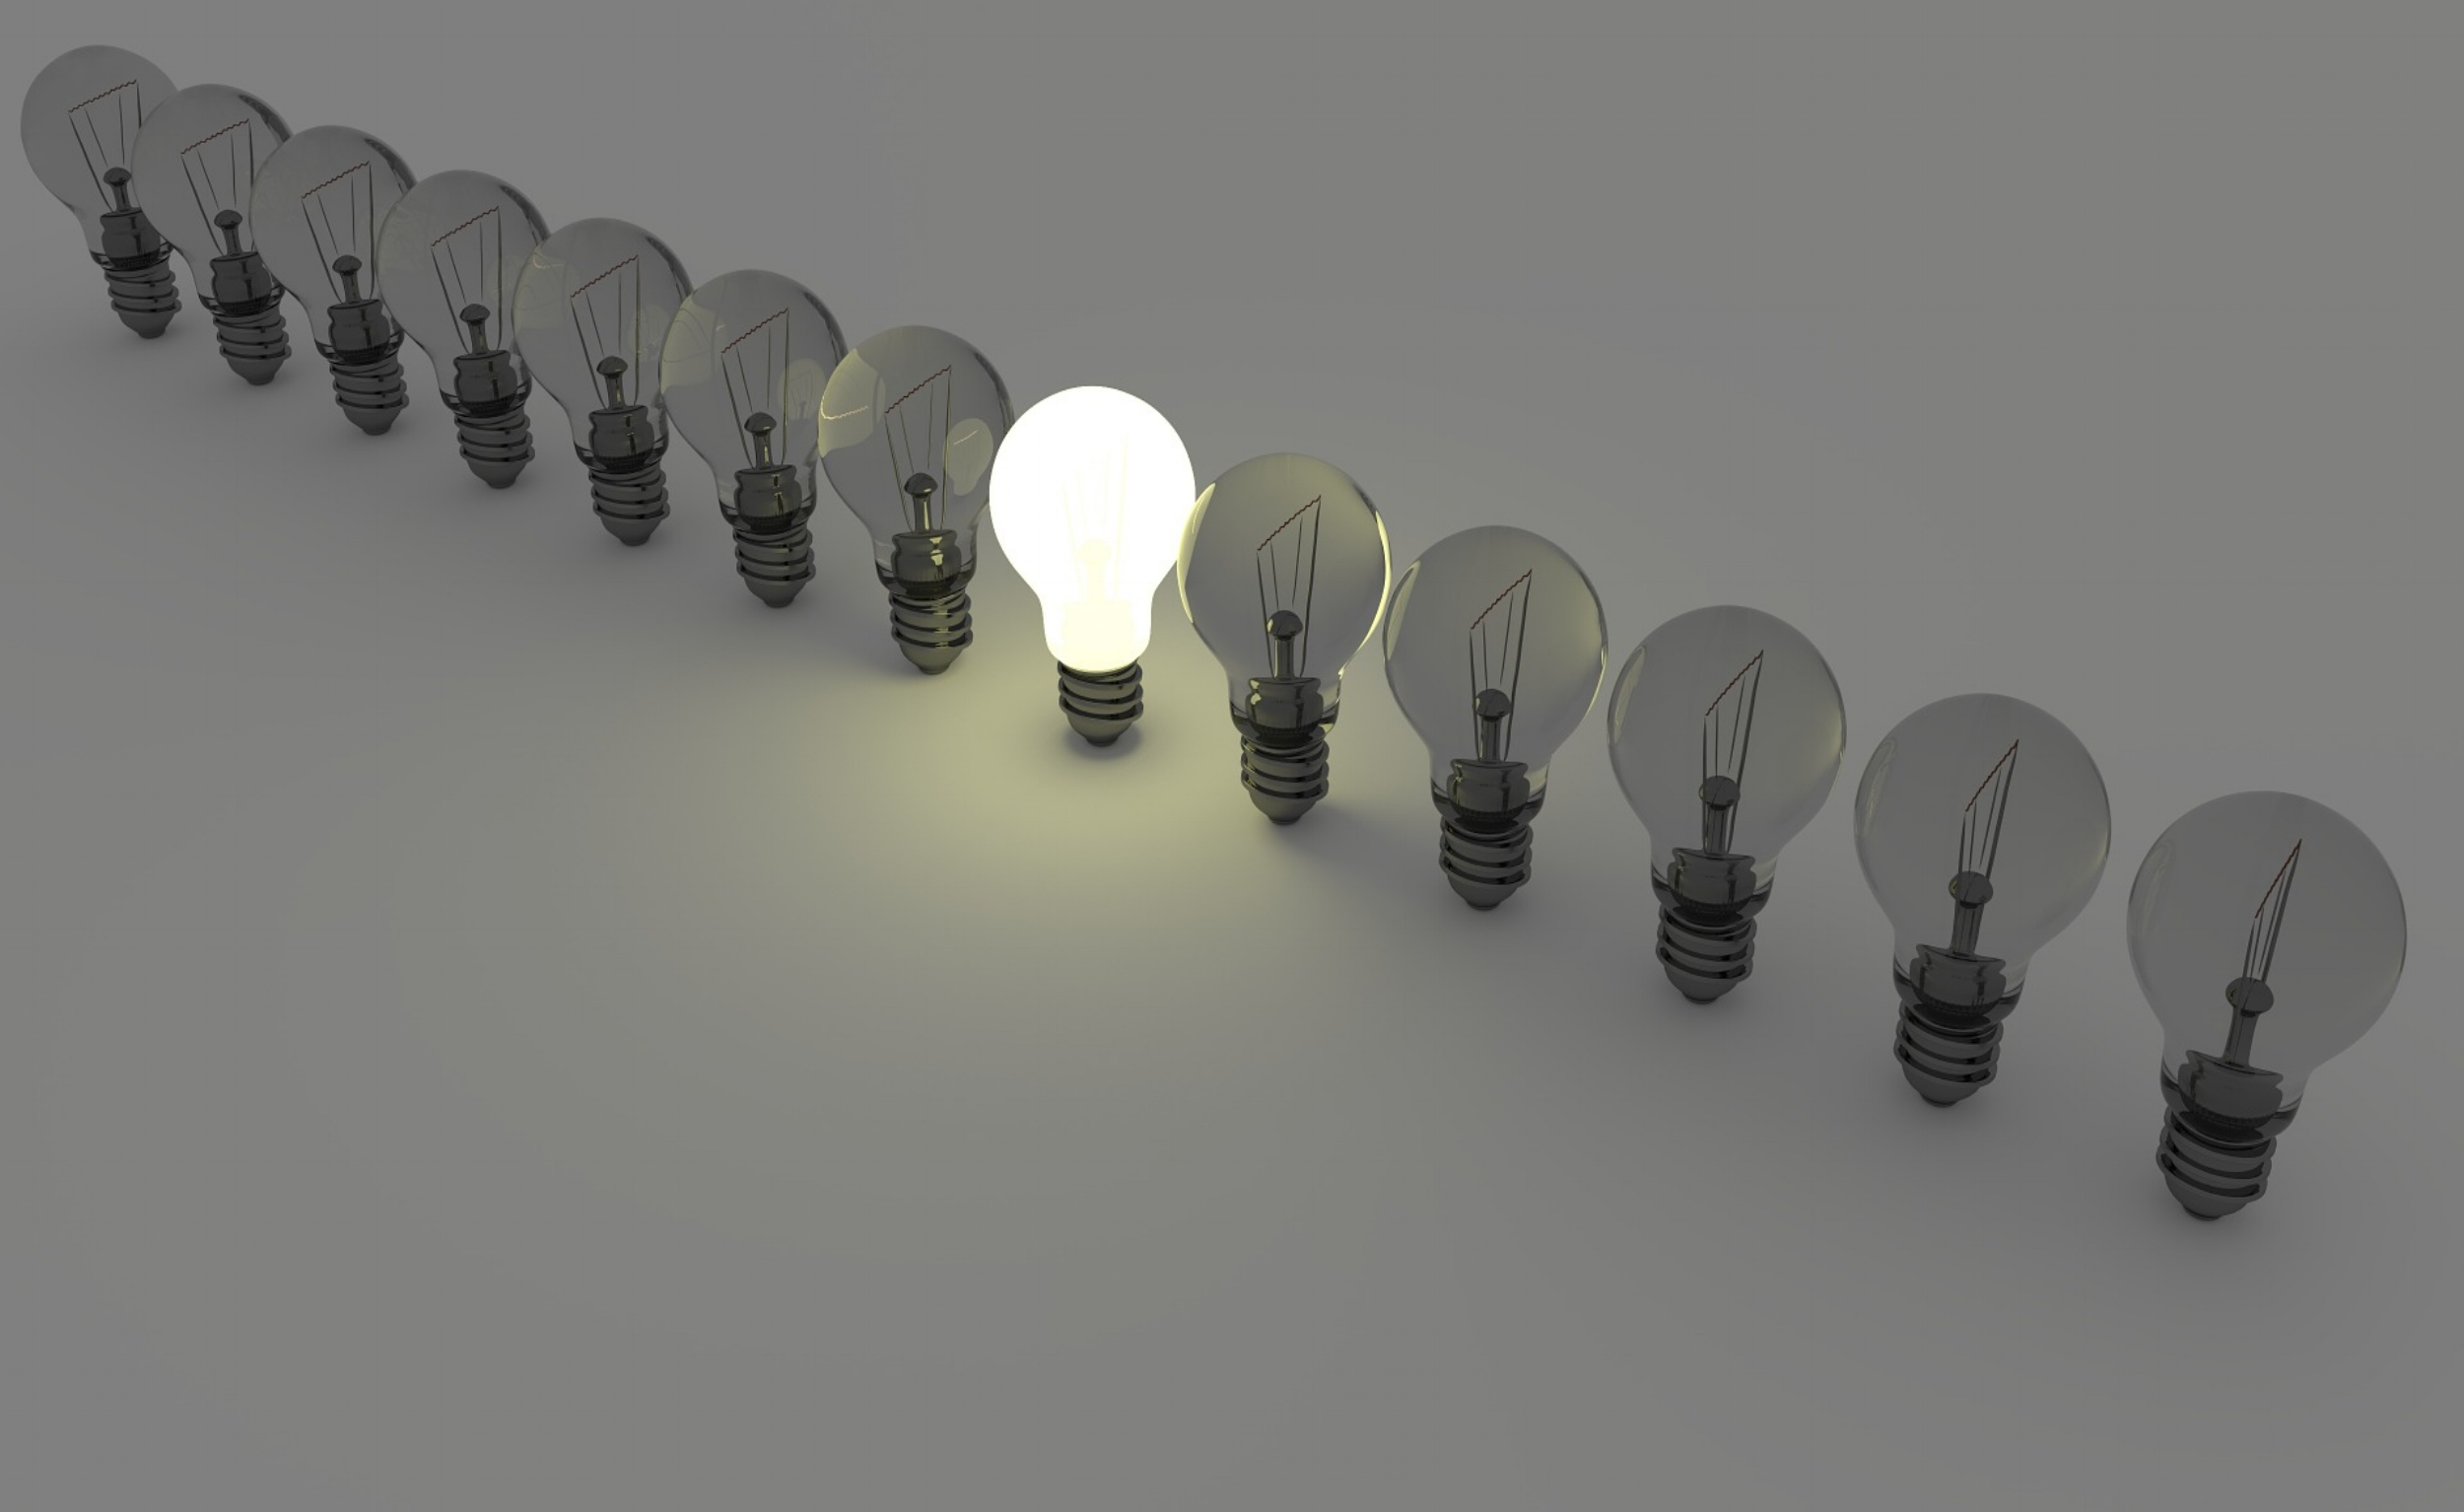 light-bulbs-1125016_1920.jpg